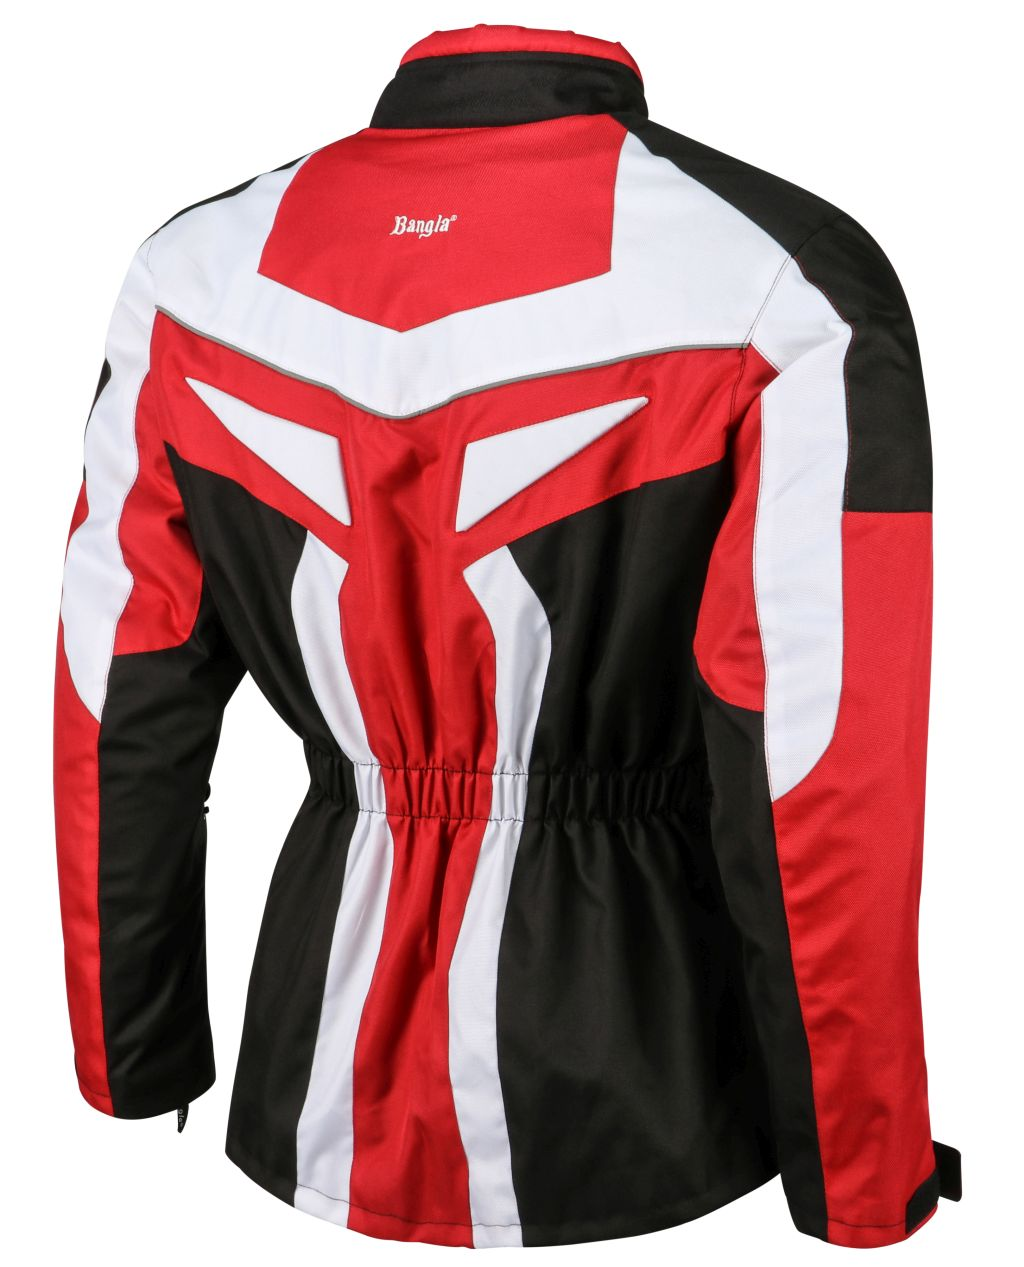 Bangla Kinder Motorrad Textil Jacke rot schwarz Motorradjacke 128-176